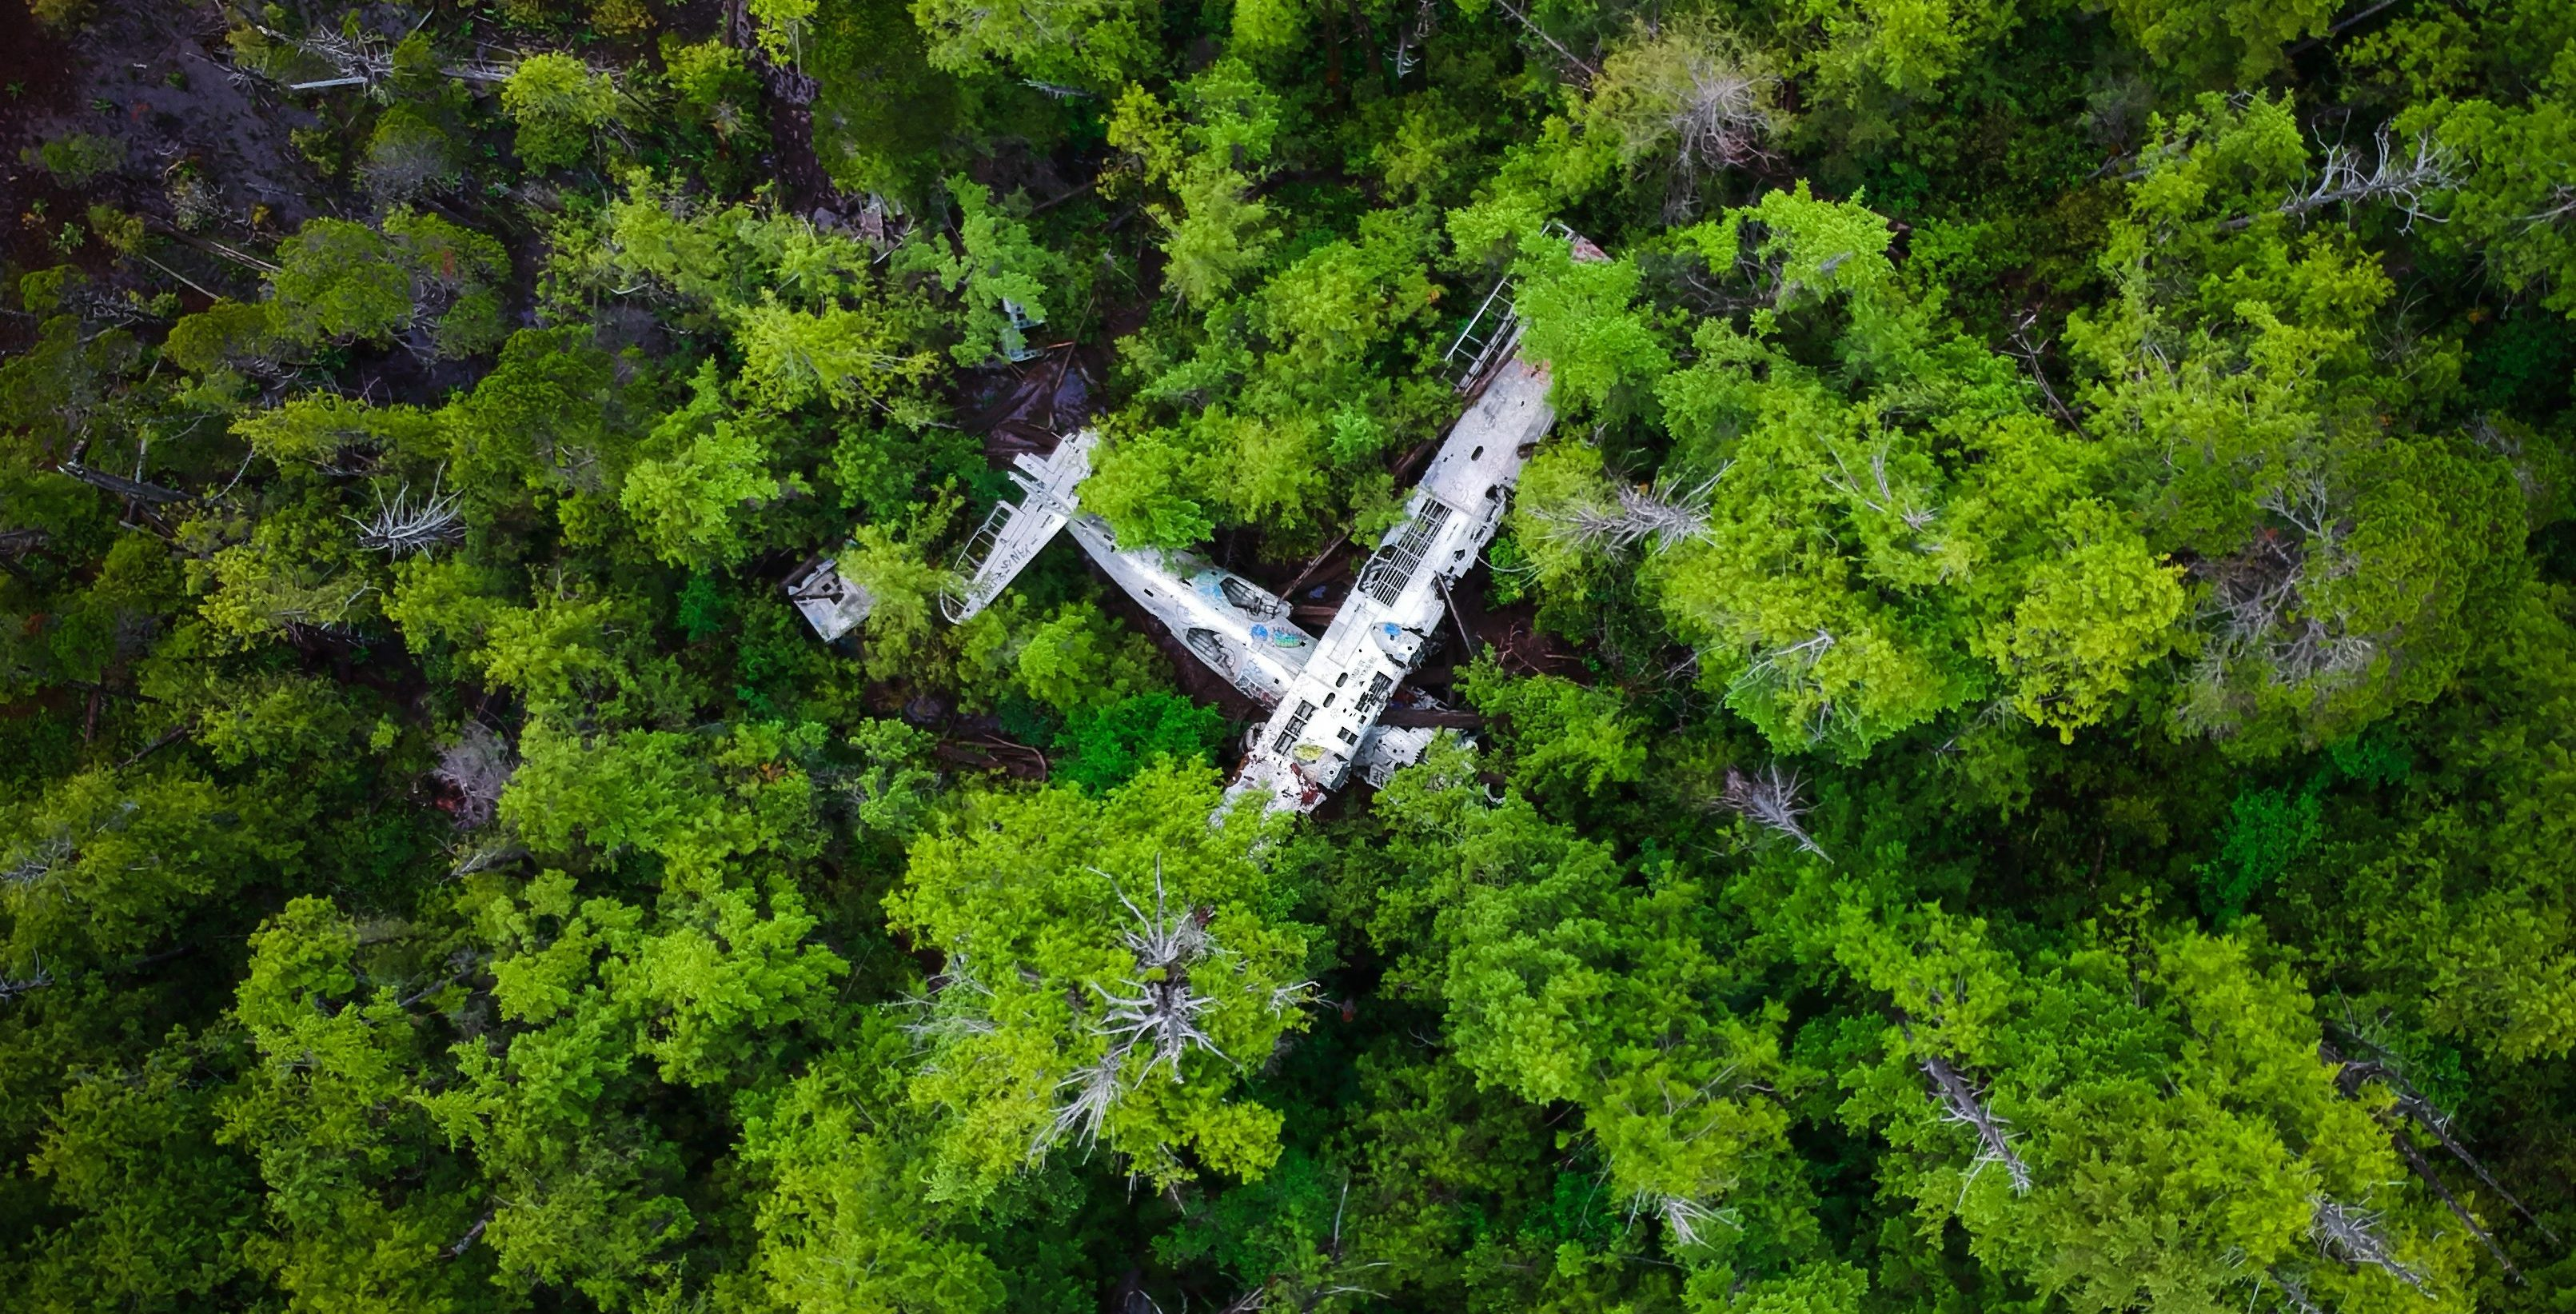 Flight 337 – Coming soon!